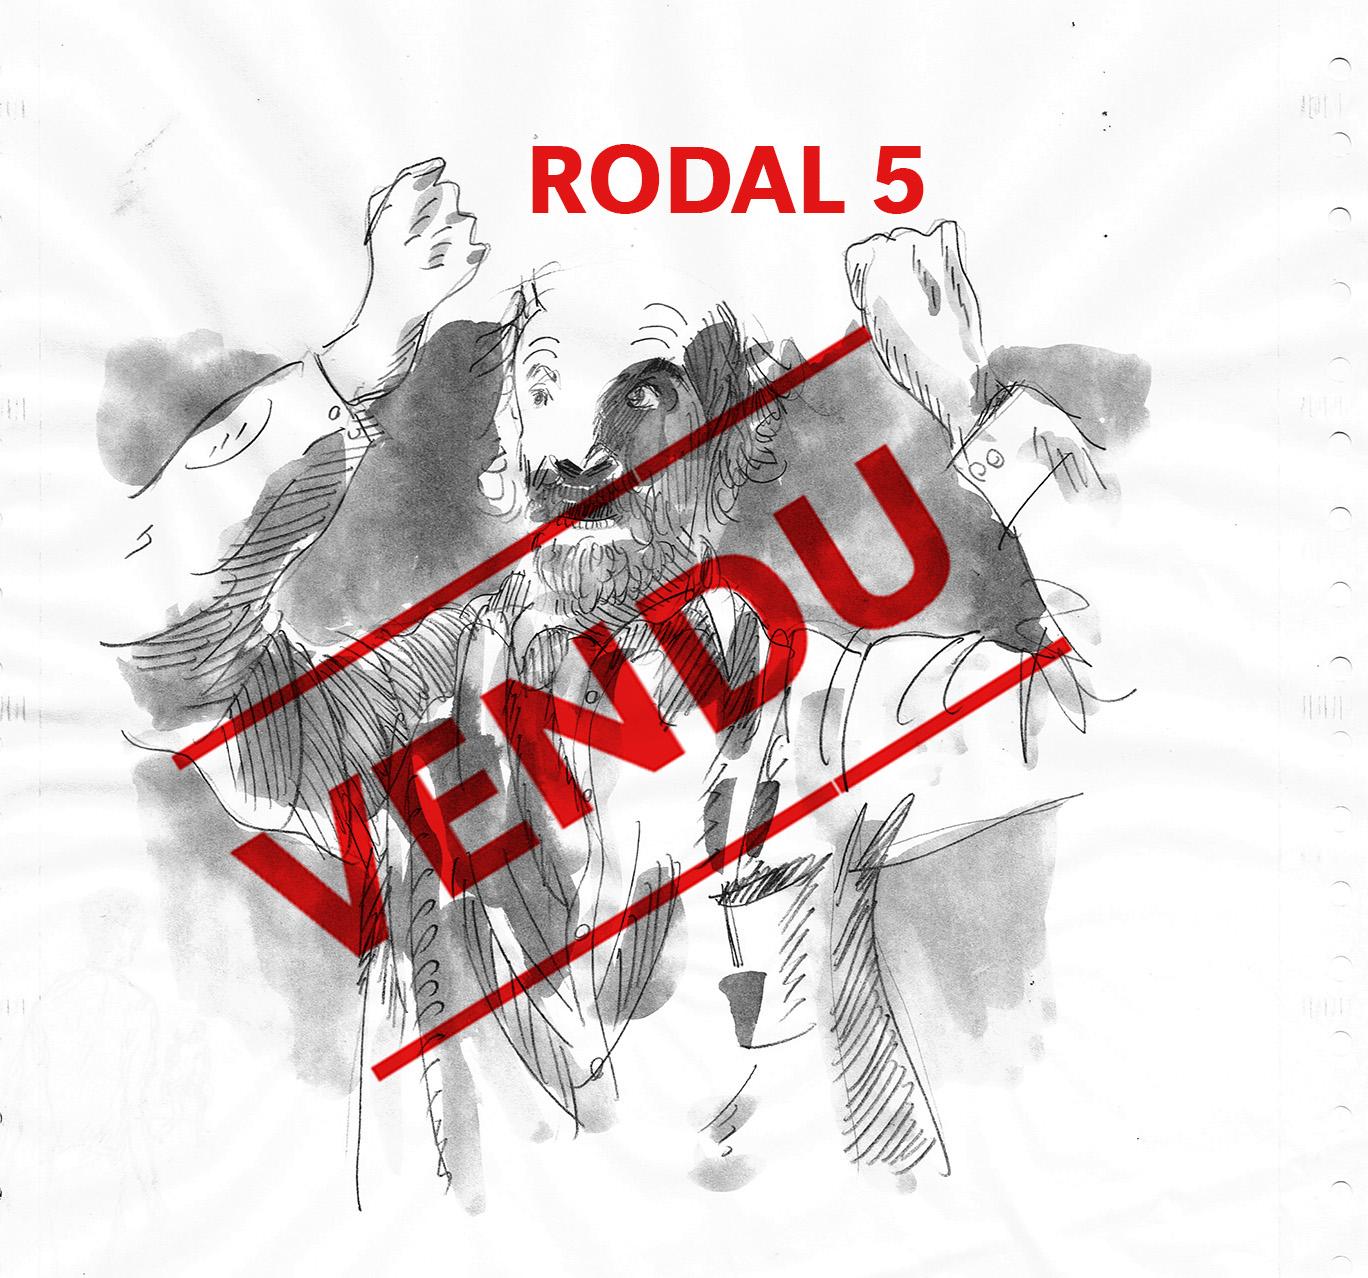 rodal_5